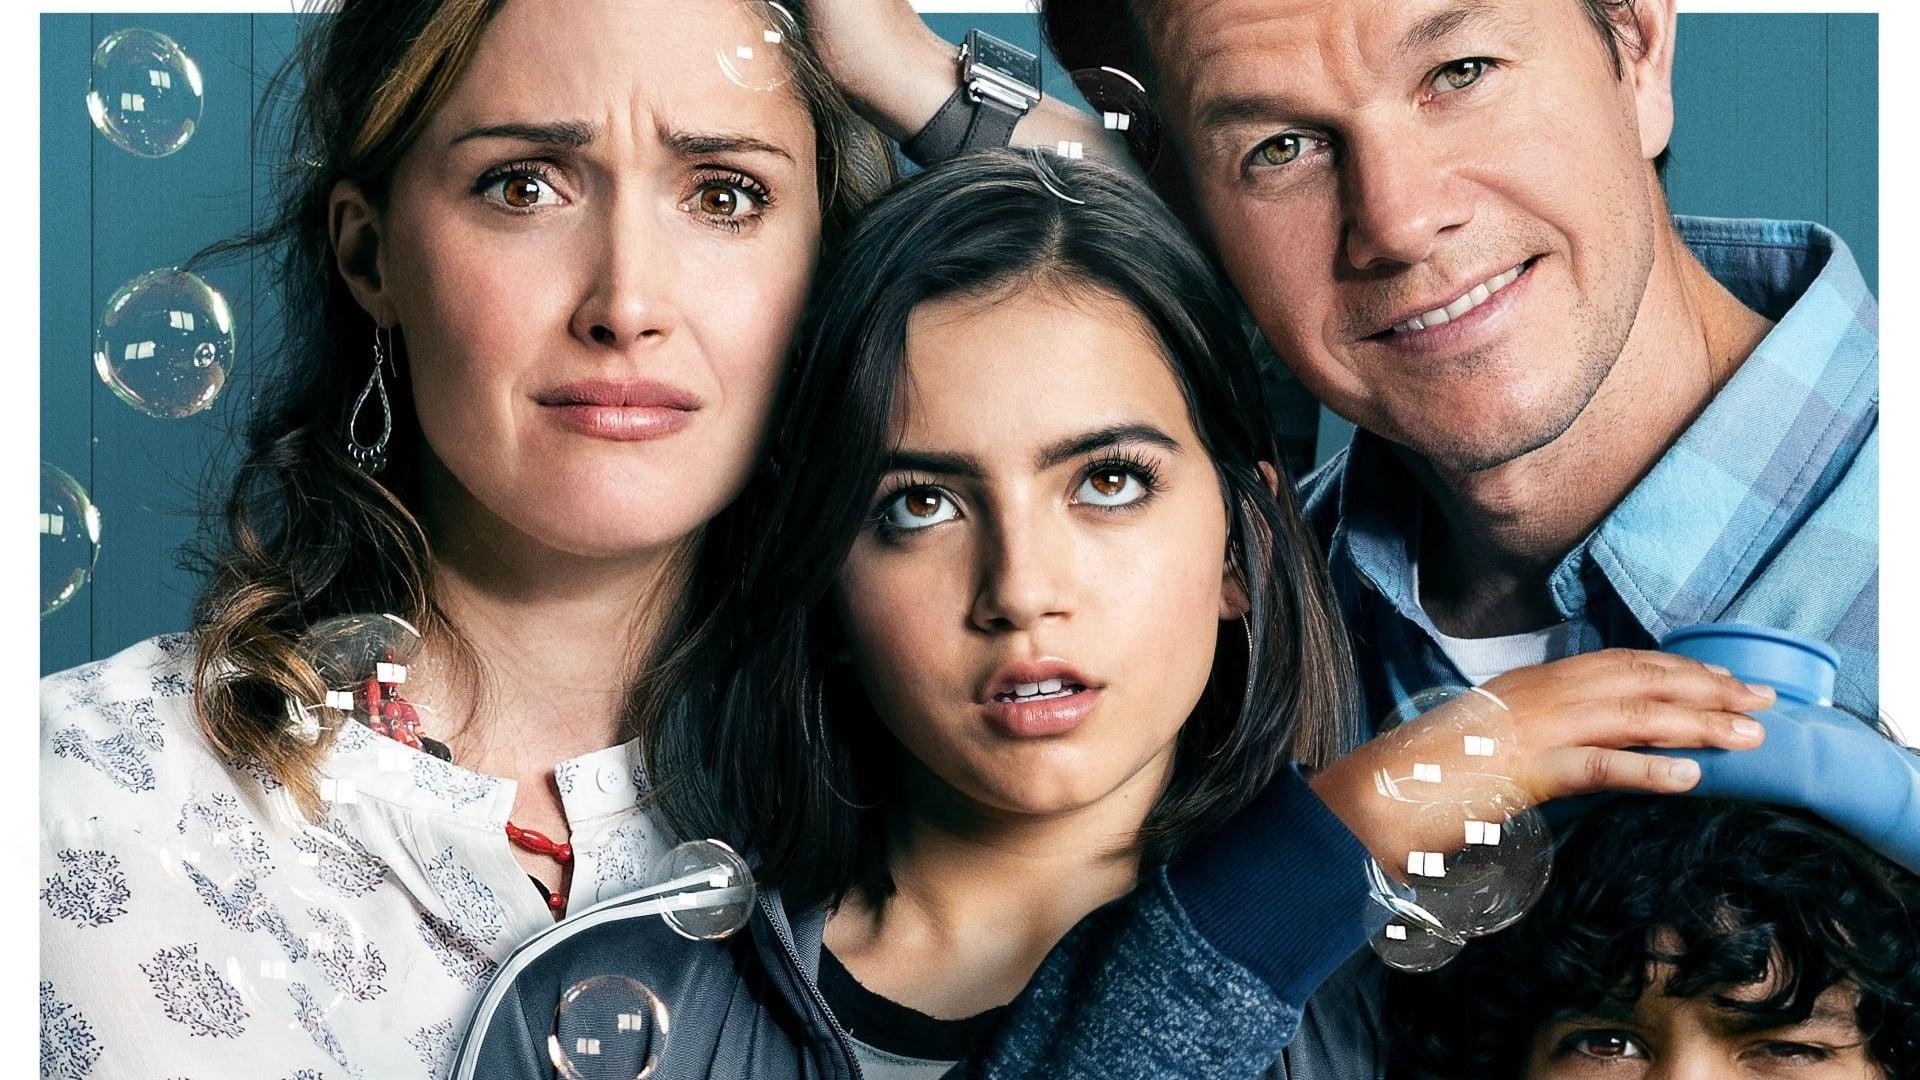 Watch Instant Family (2018) full movie on Putlockertv